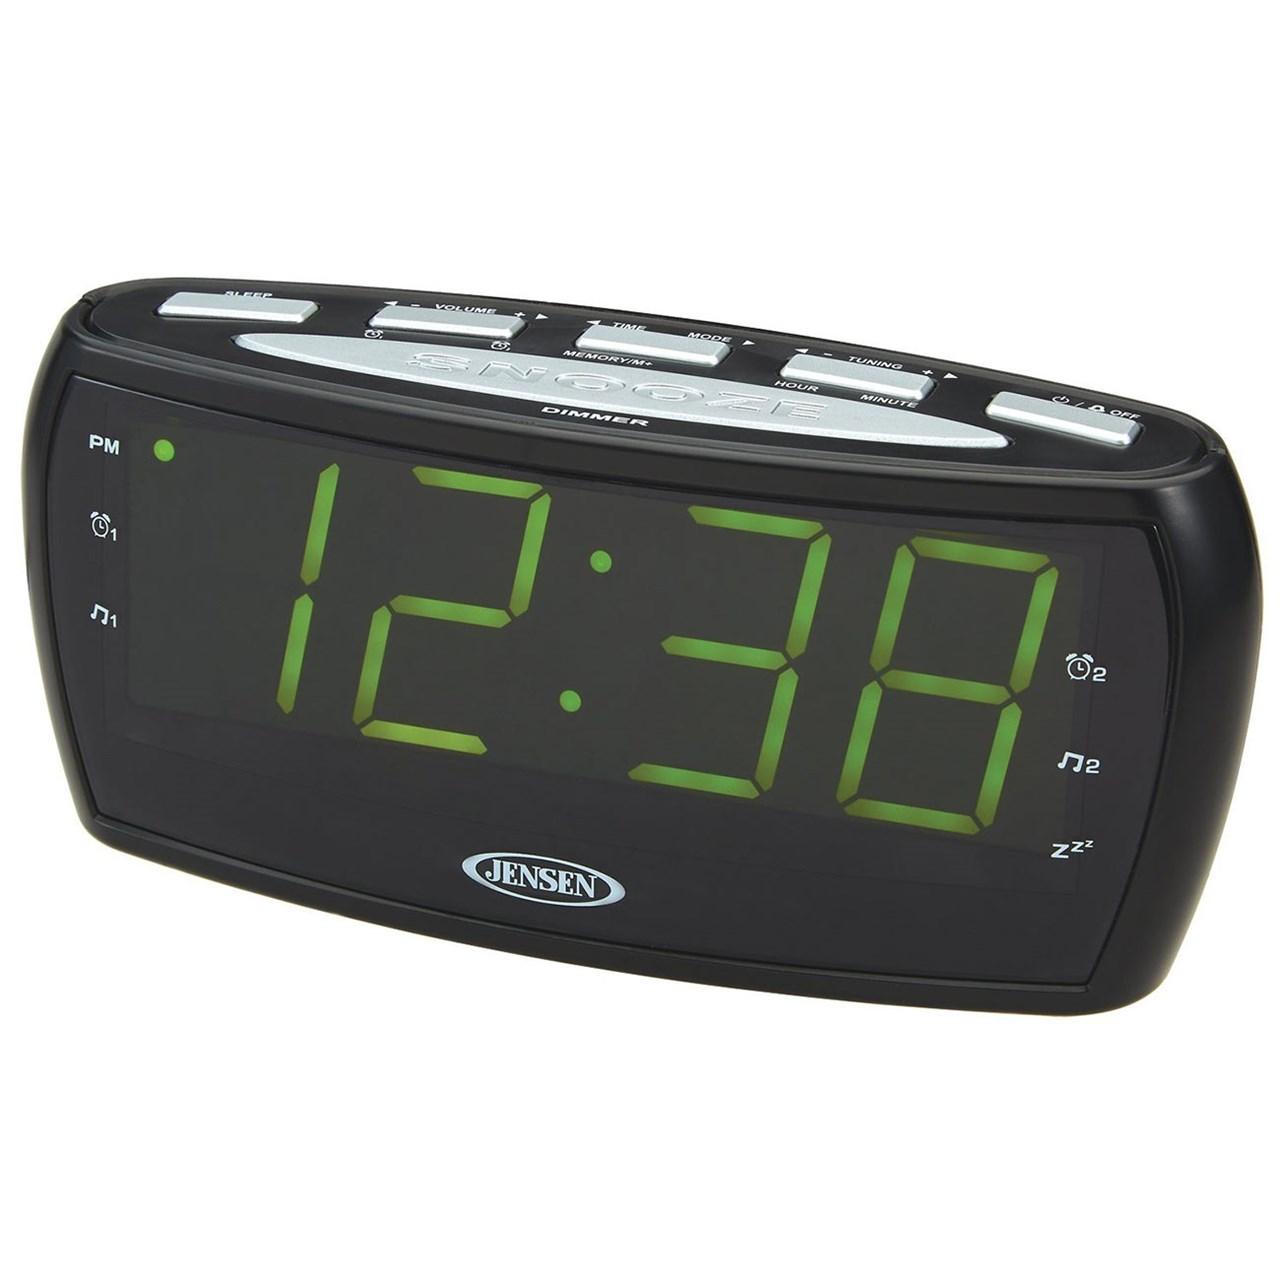 maxiaids jensen digital am fm dual alarm clock radio. Black Bedroom Furniture Sets. Home Design Ideas